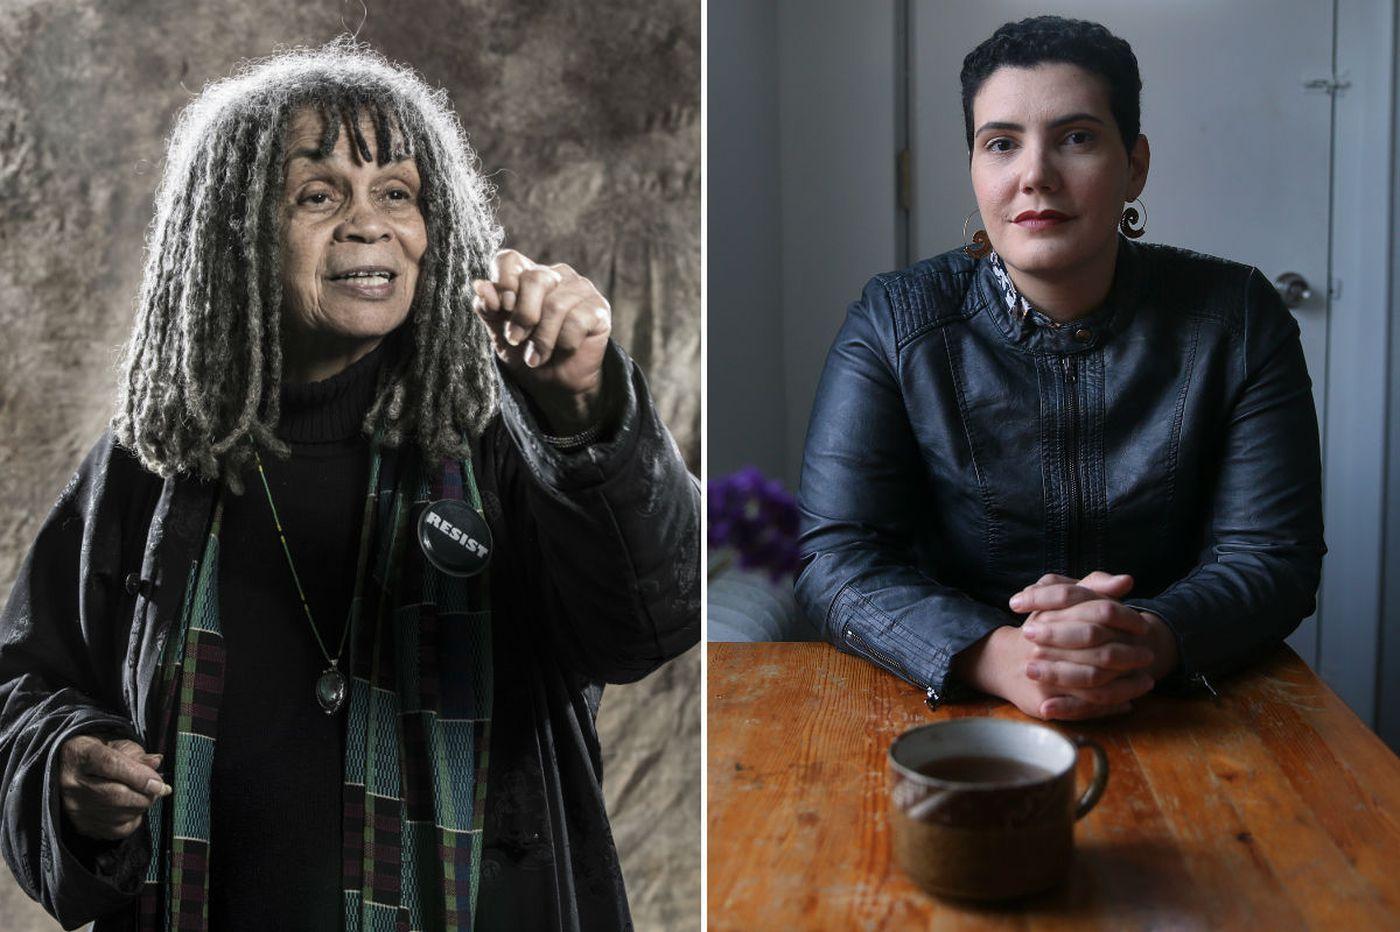 Philly poets Sonia Sanchez and Raquel Salas Rivera win big national awards